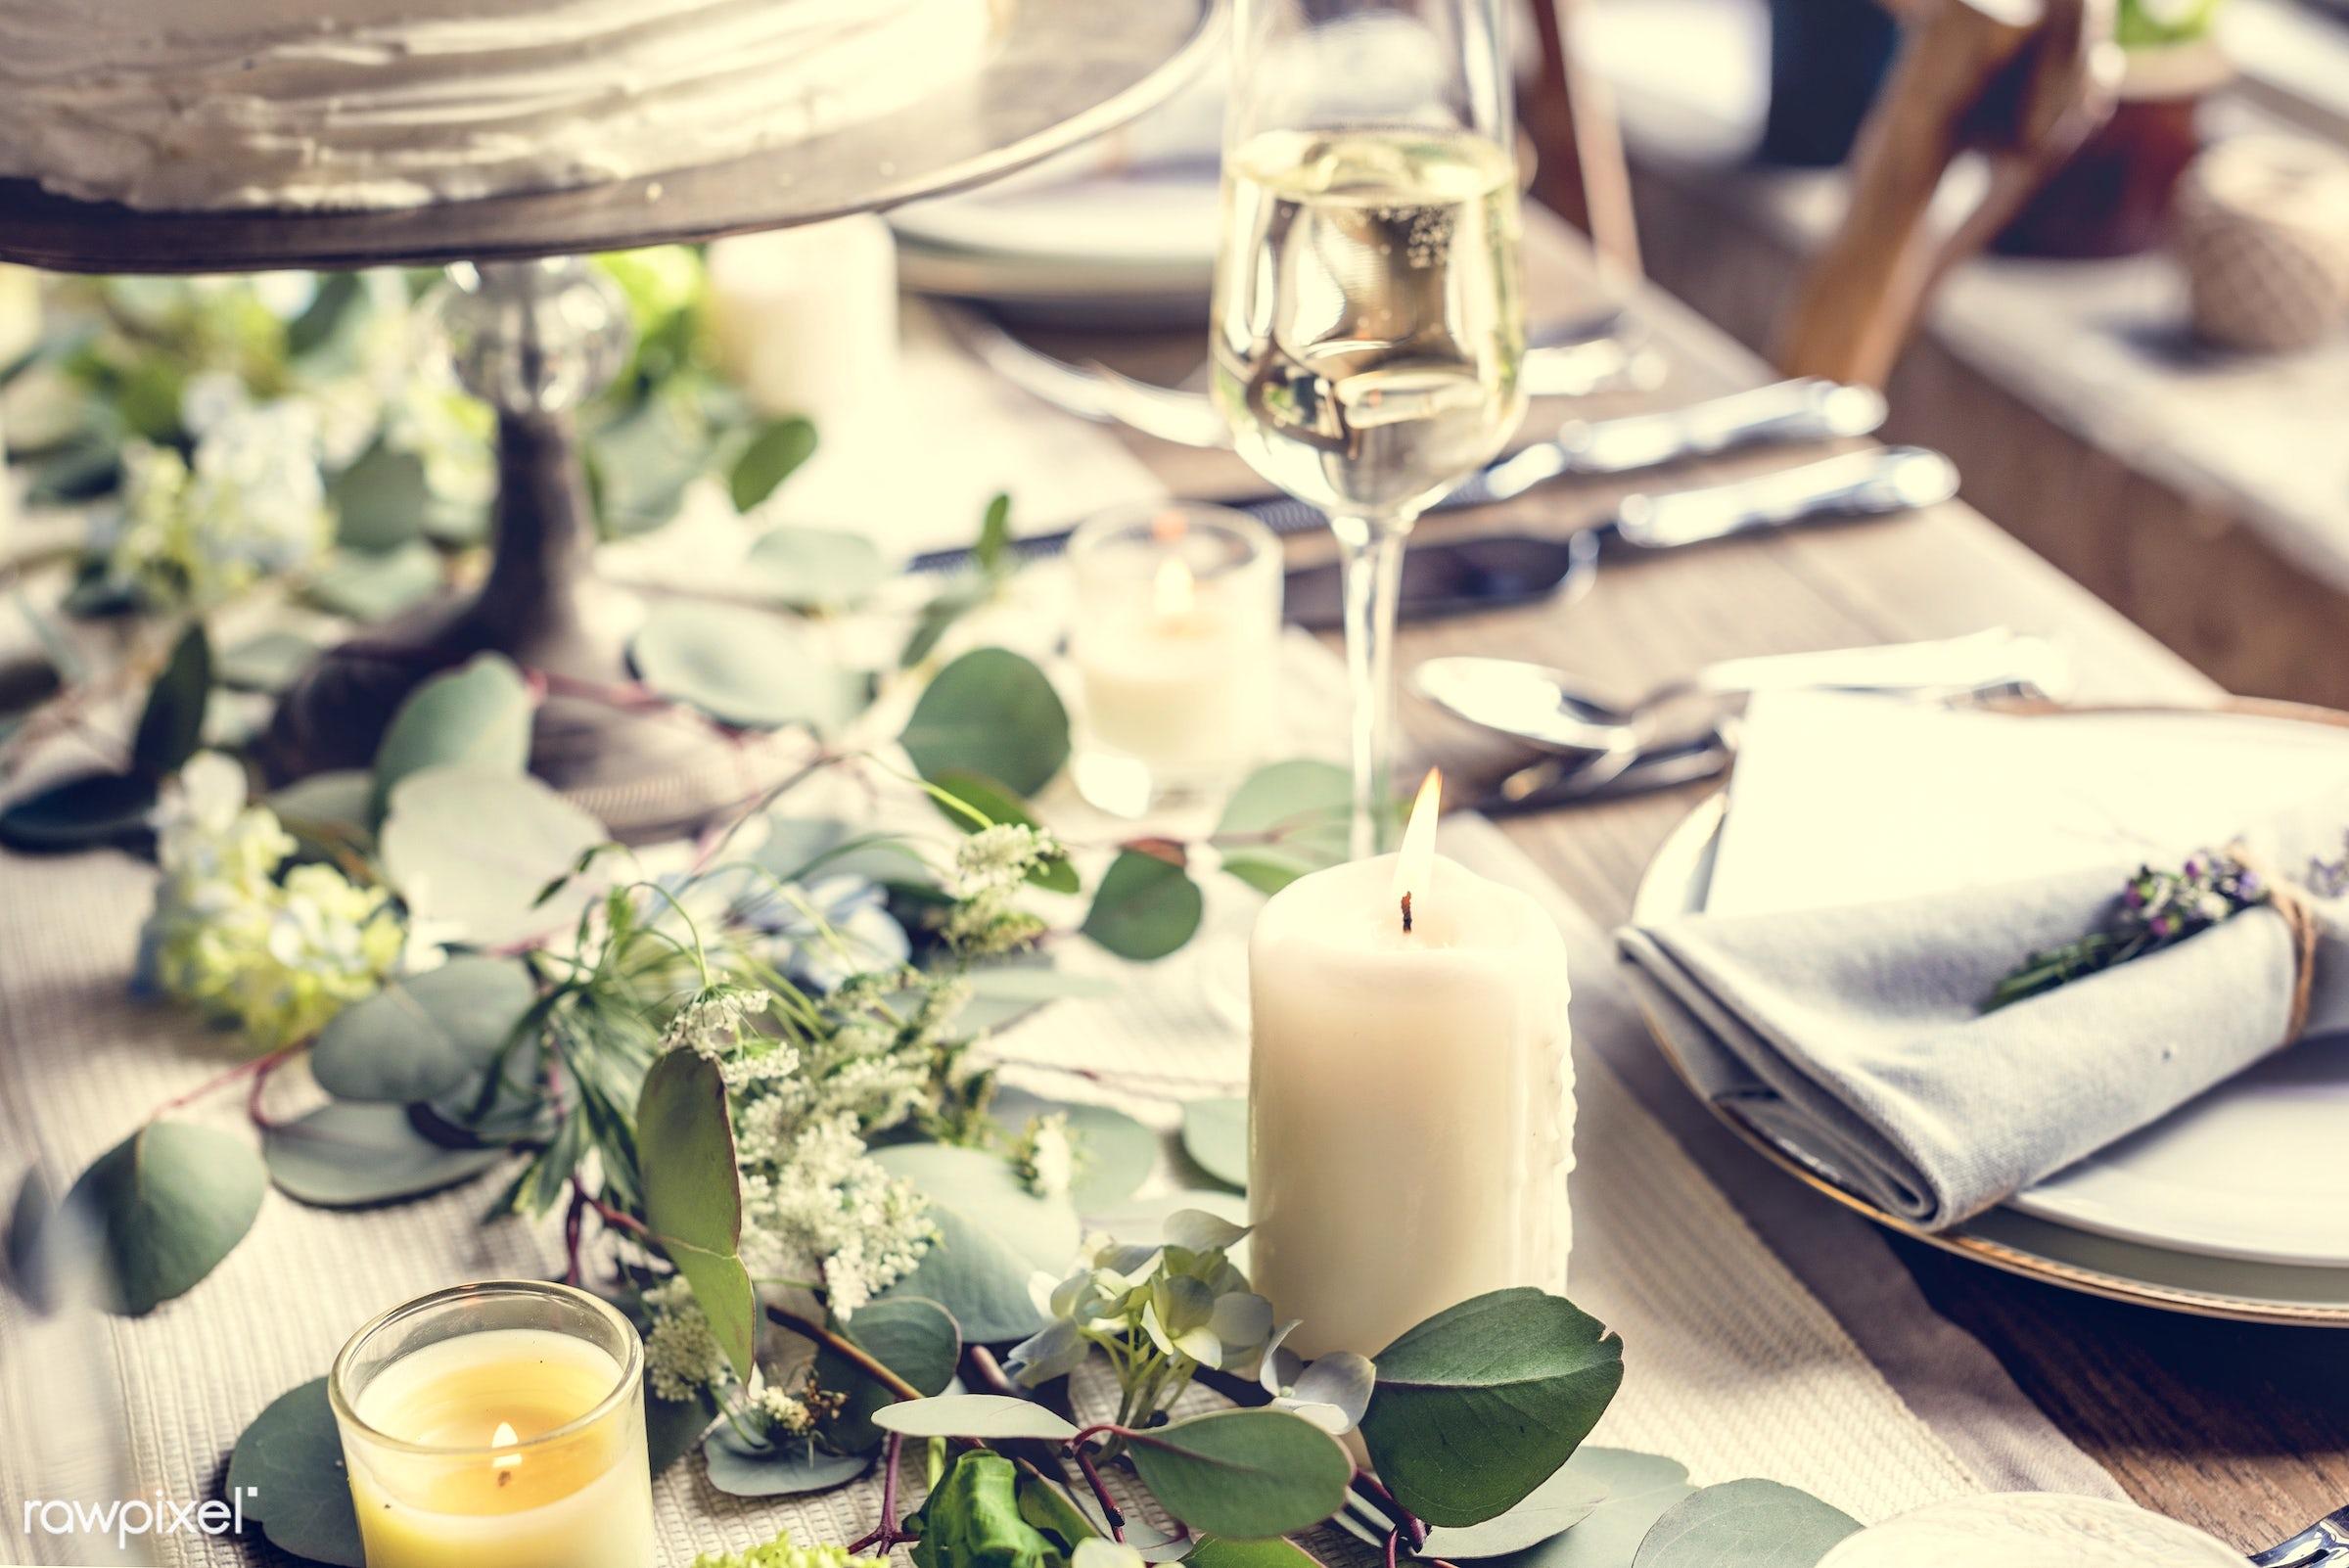 dish, nobody, fancy, cutlery, hydrangea, leaf, silverware, leaves, party, decor, tablecloth, gather, event, lunch, flower,...